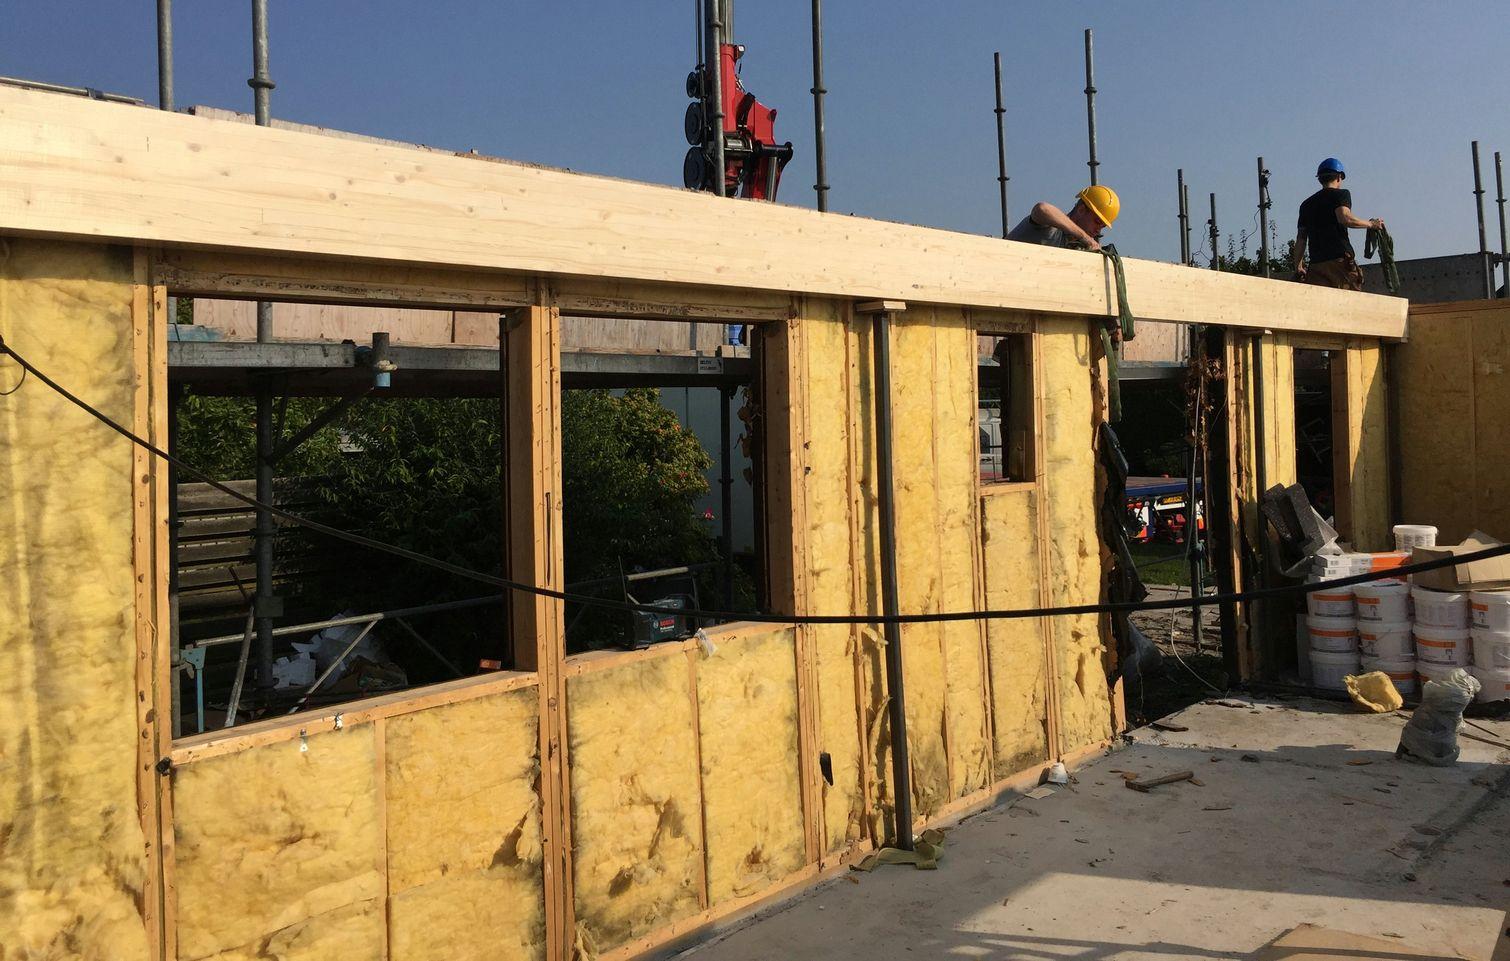 #BF7B0C Dette års Drømmer Du Også Om At Bygge En 1. Sal Med Loft Til Kip? Gør Det Selv Loft Til Kip 5691 15109615691